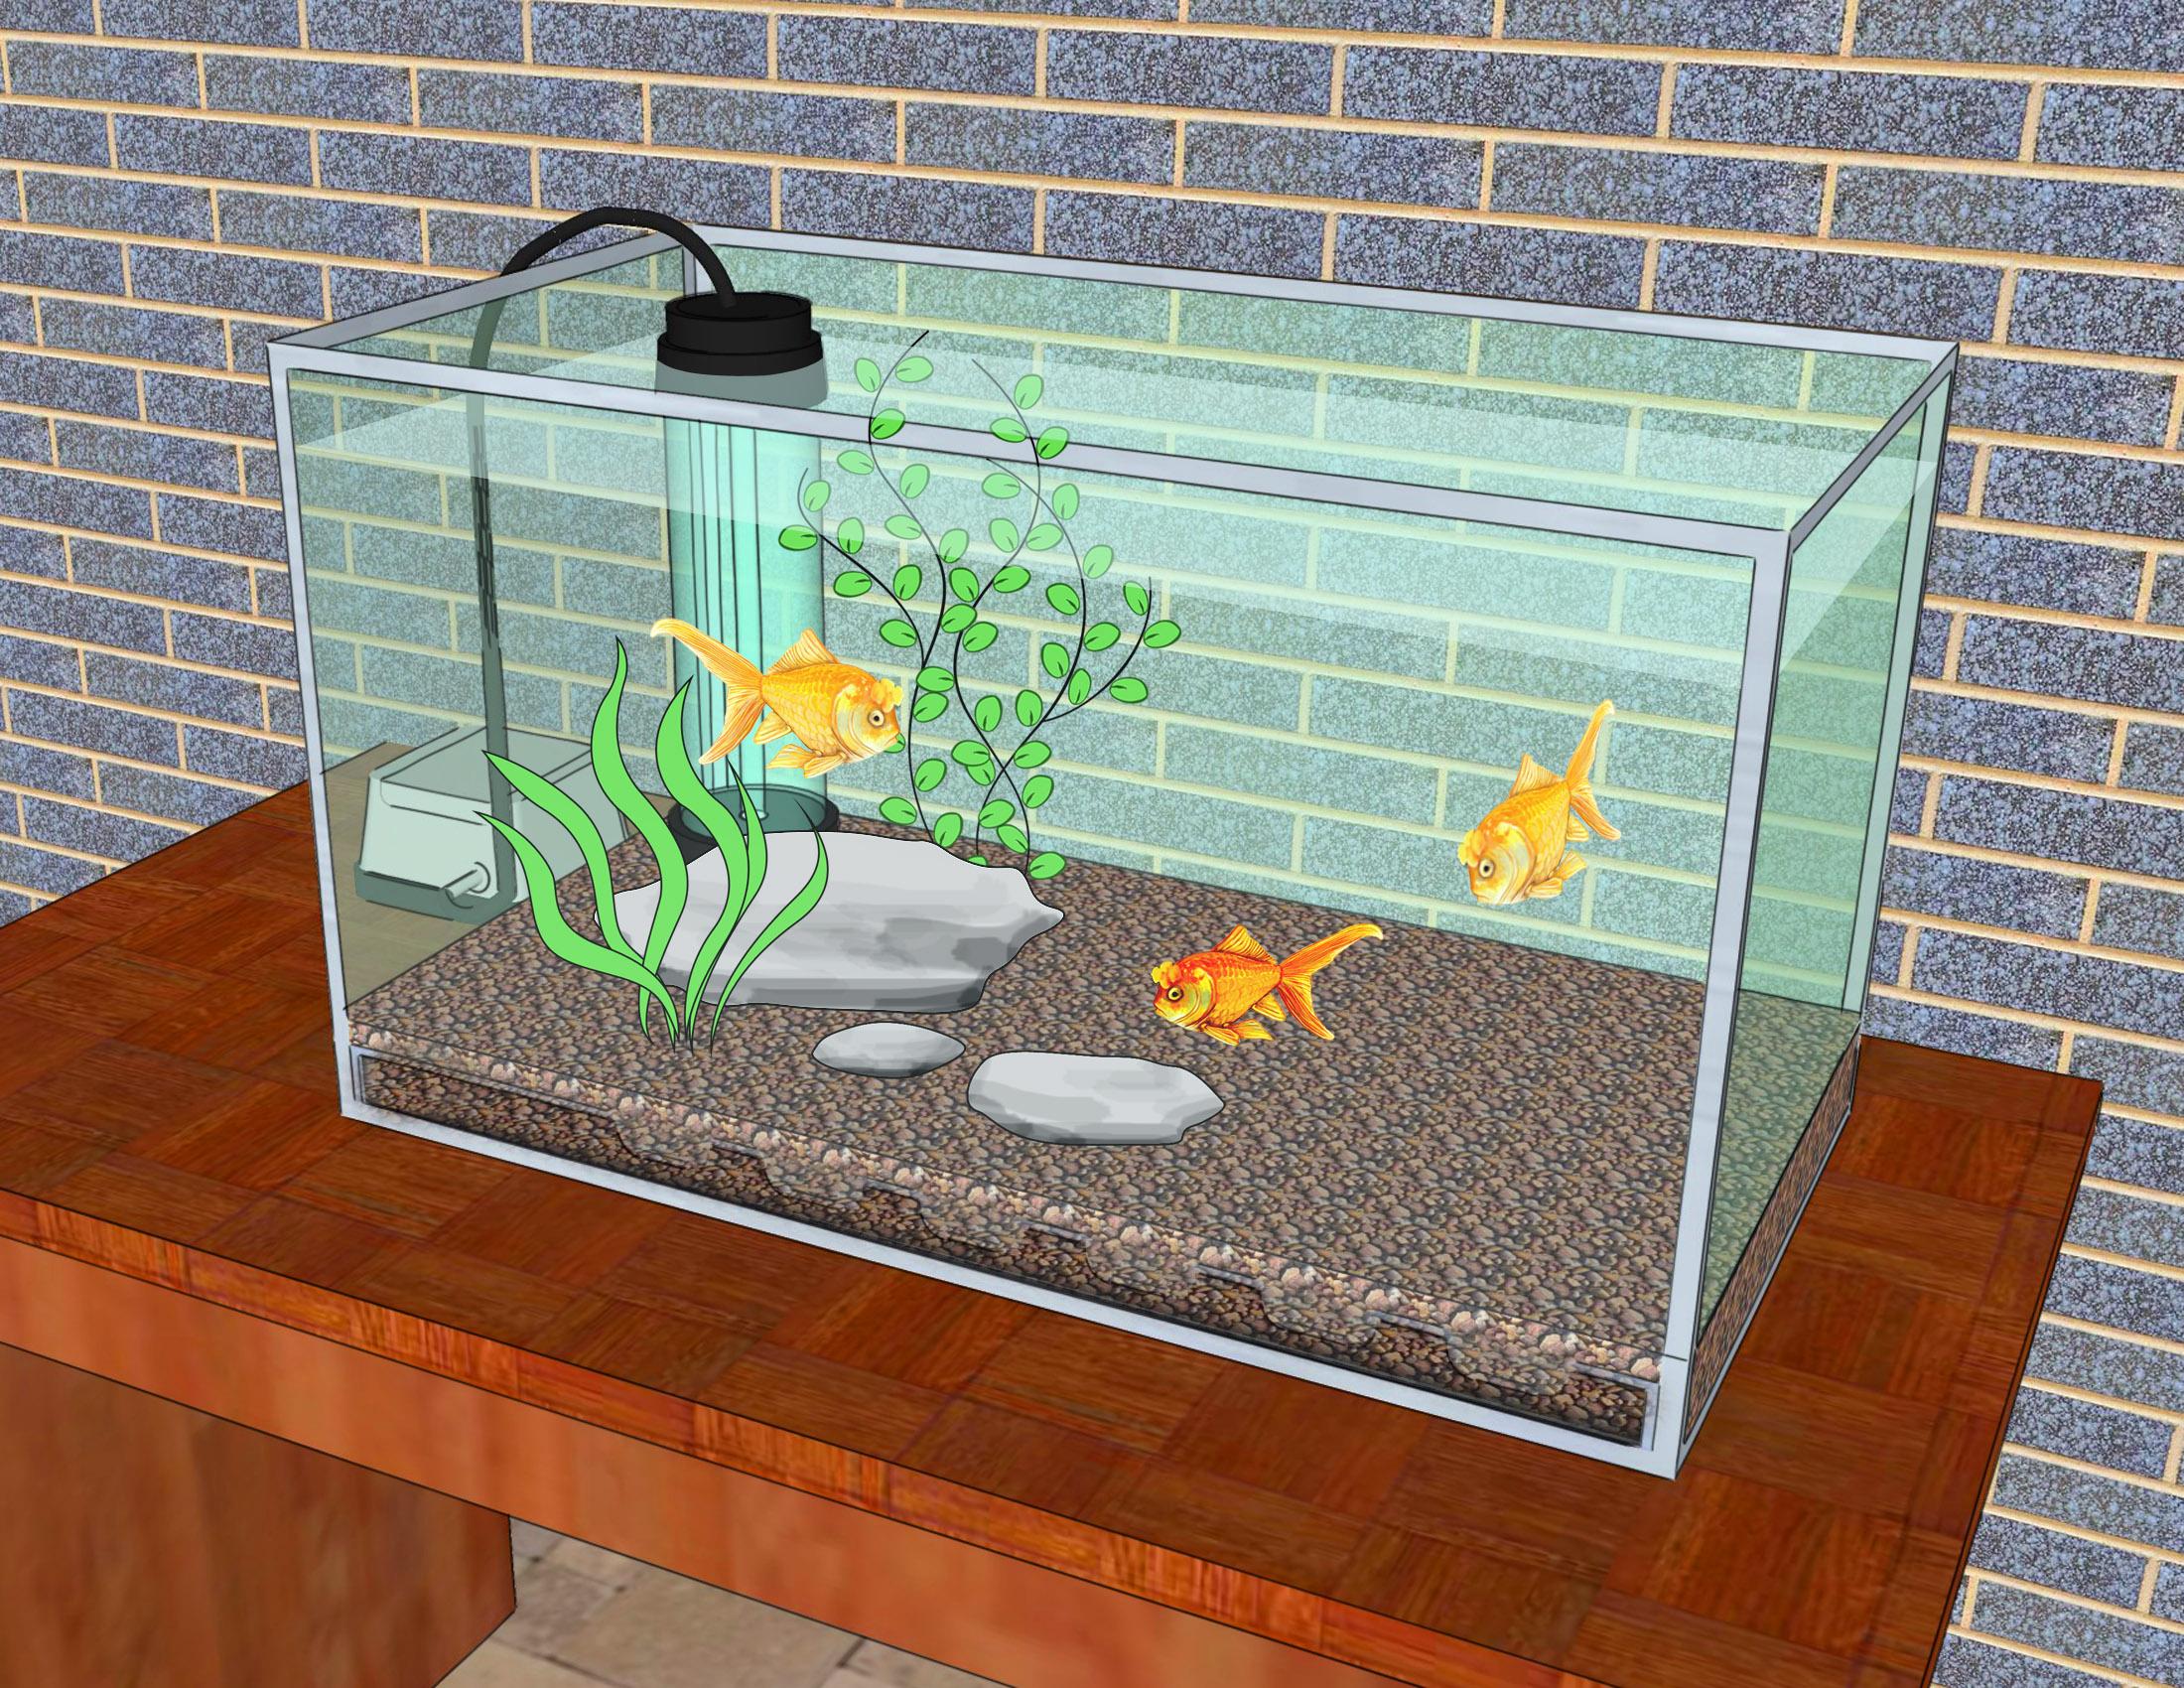 Aquarium Thermostat Heater Facias Kegerator Temperature Controller Using Stc1000 Diy Keezer Build Stc 1000